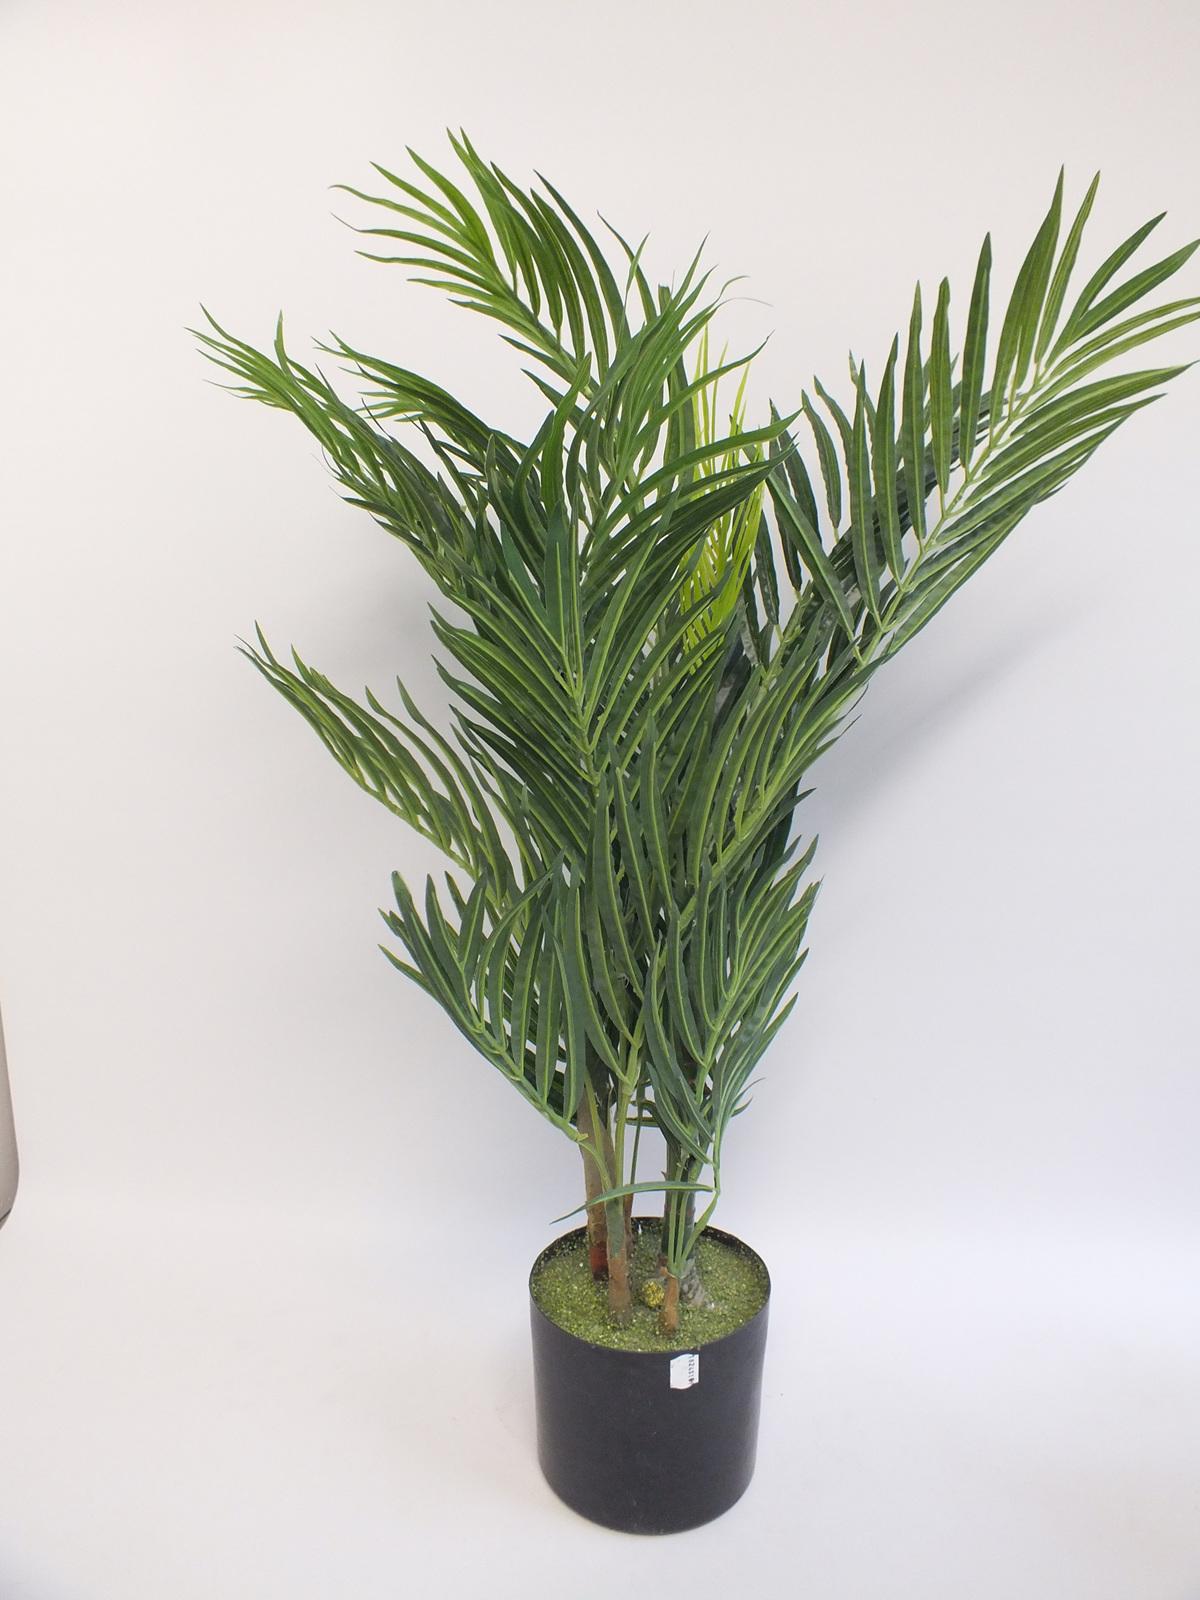 Areca Palm in pot 4041 - The Silk Flower Company